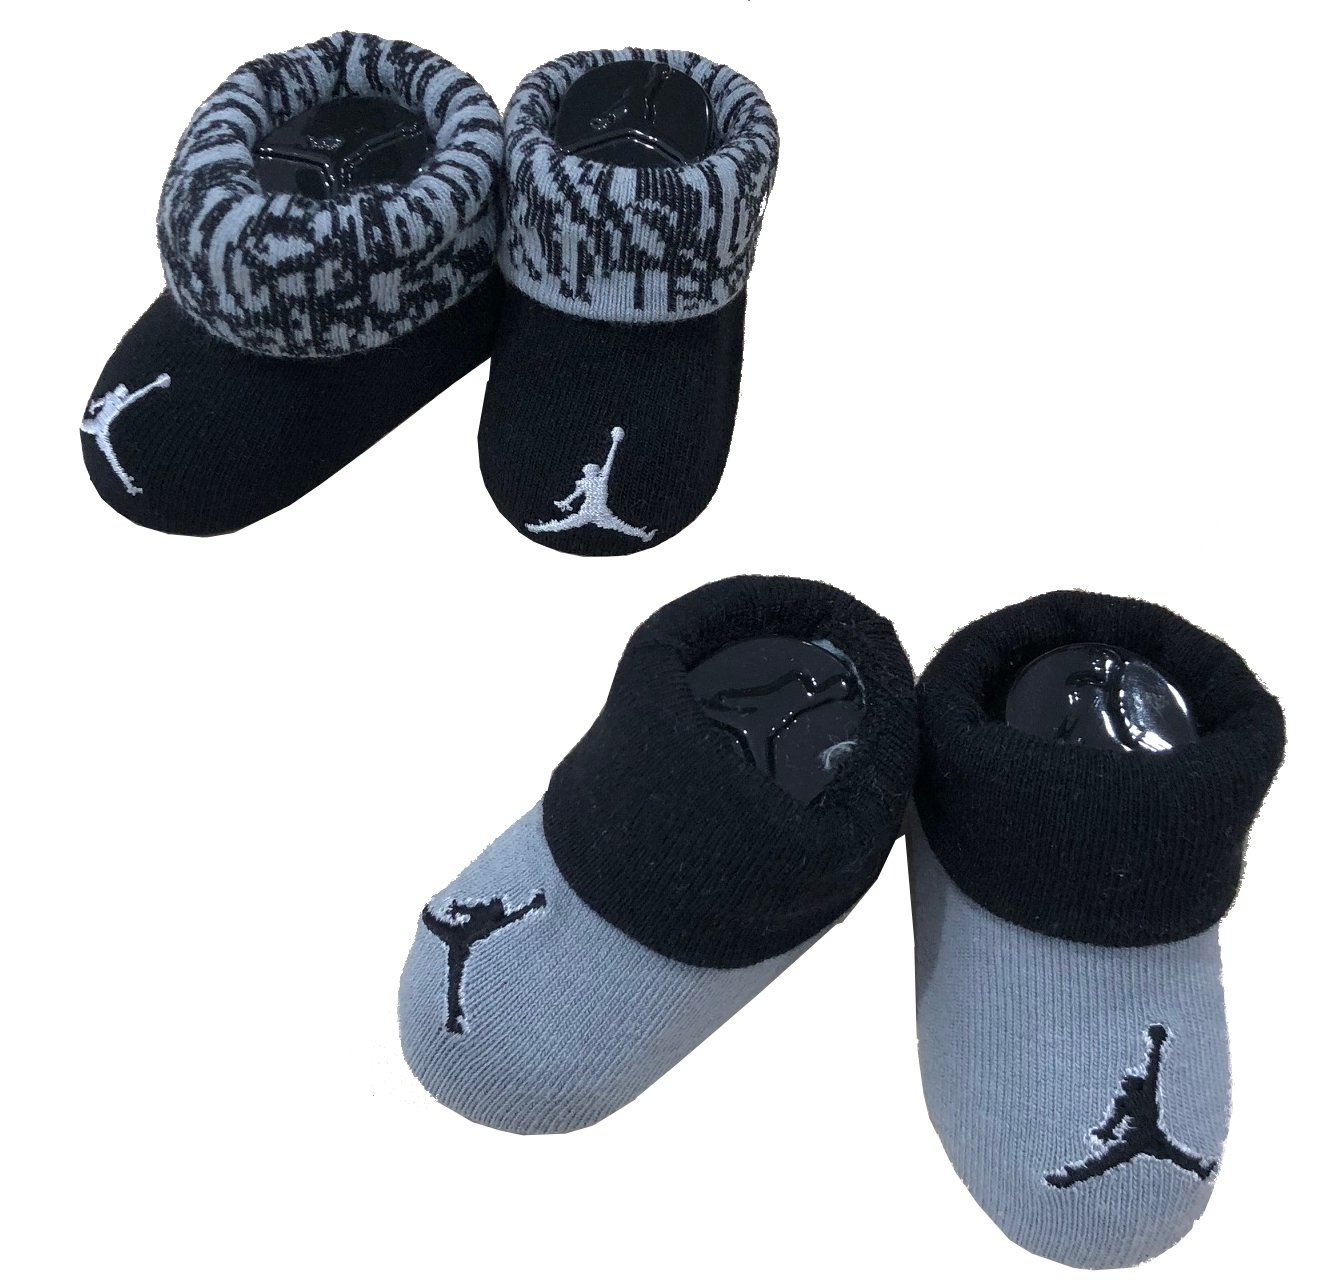 e1e55c95ad0 Nike Michael Jordan Booties 0-6 Months 2 Pairs: Amazon.co.uk: Sports &  Outdoors